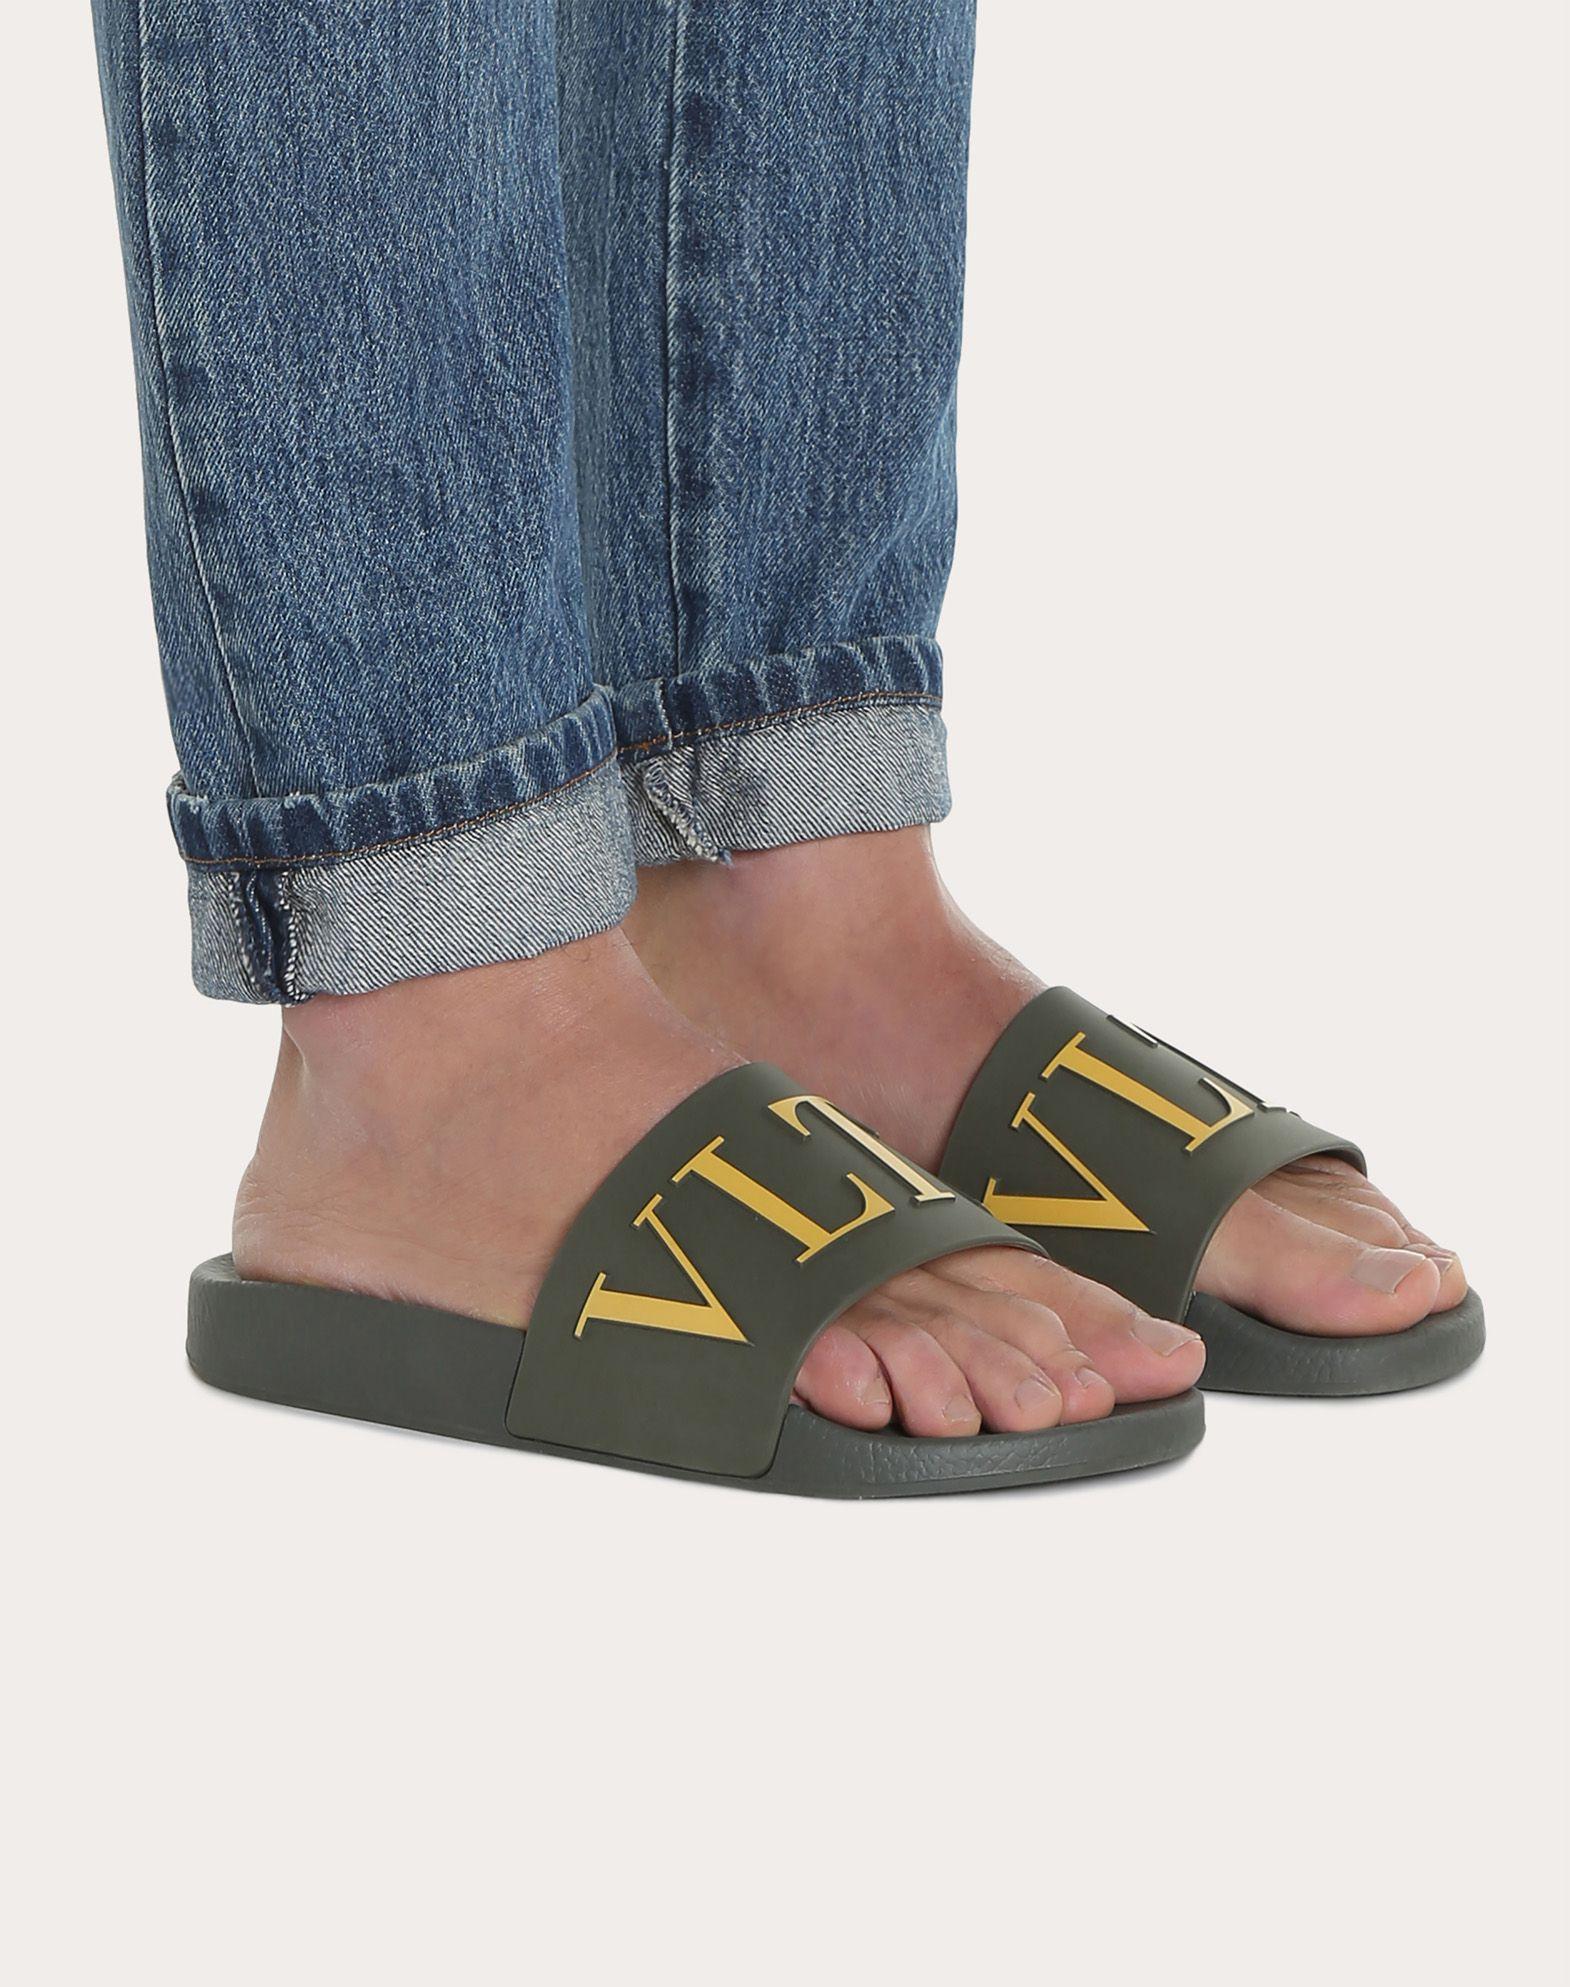 VALENTINO GARAVANI UOMO PY0S0873SYE GRE 橡胶拖鞋式凉鞋 U b